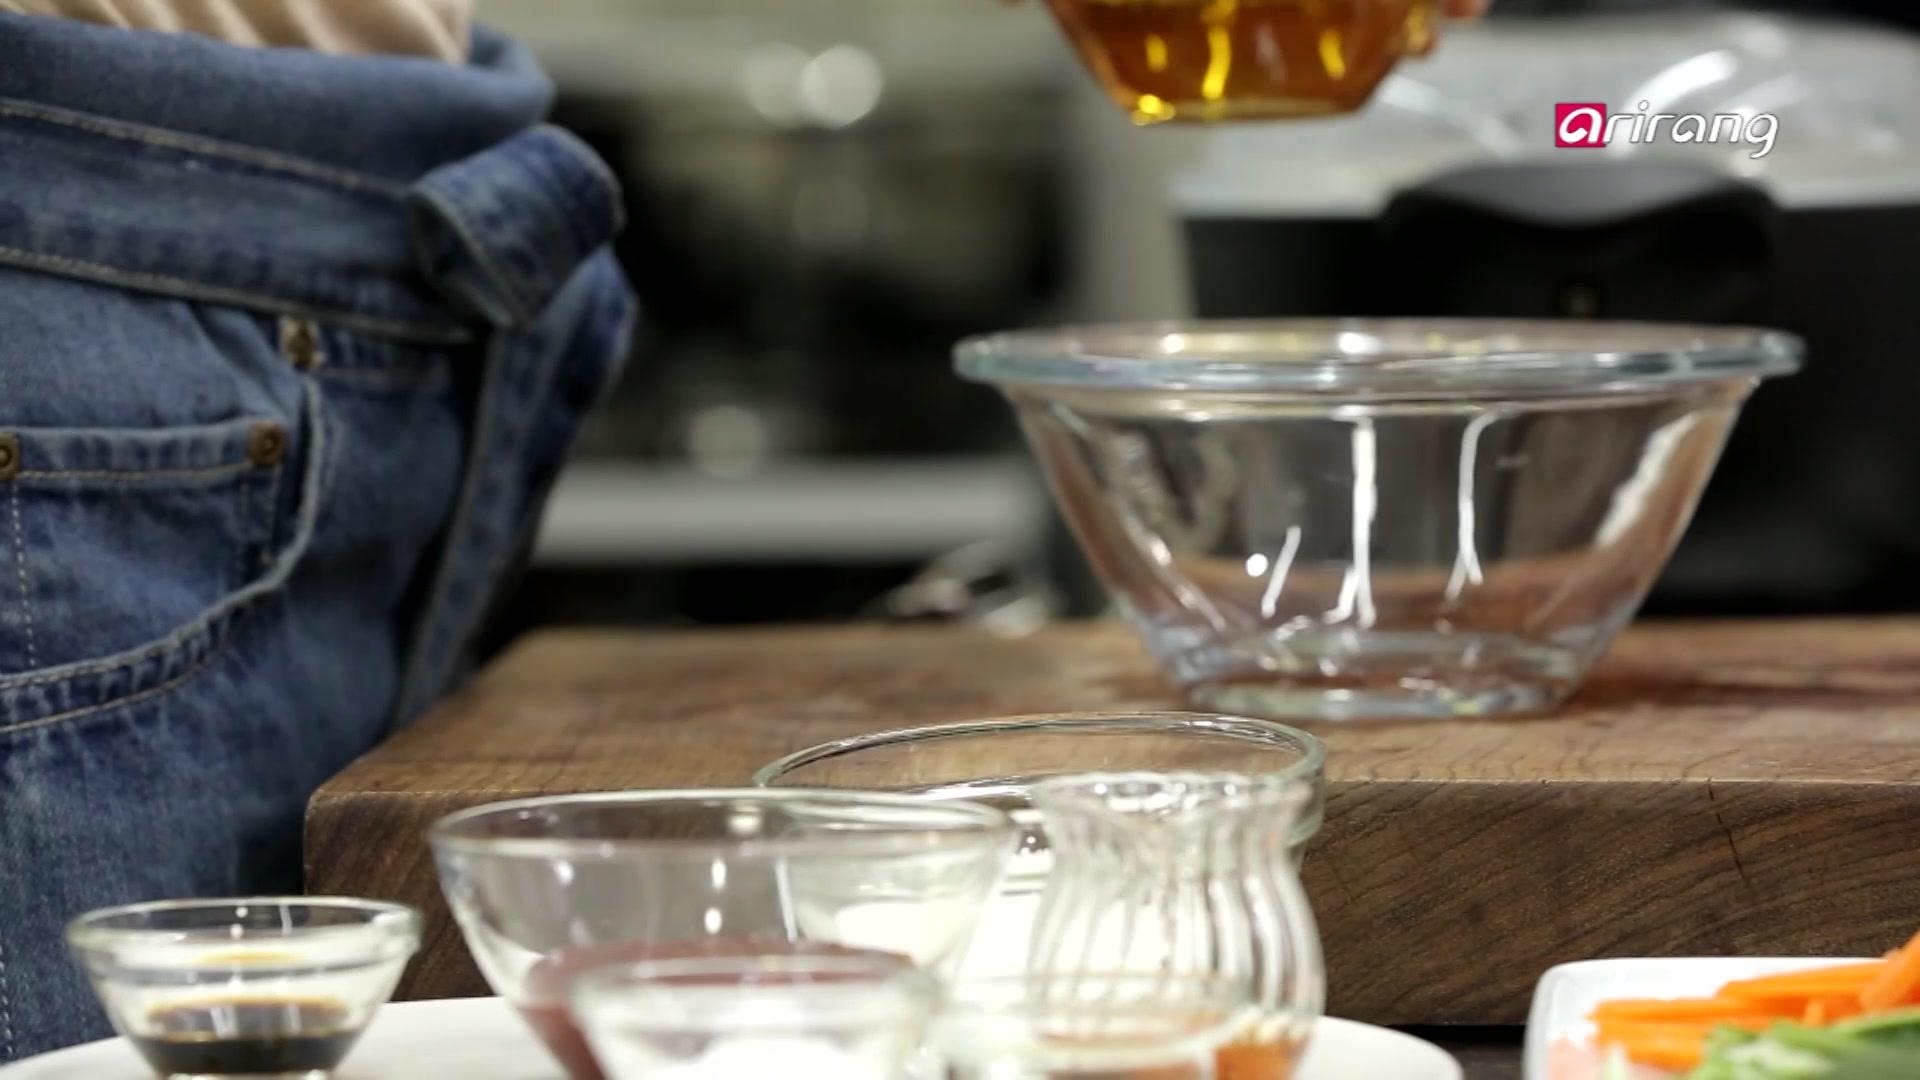 My Little Kitchen Season 2 Episode 8: Seaweed Soup, Mung Bean Pancake